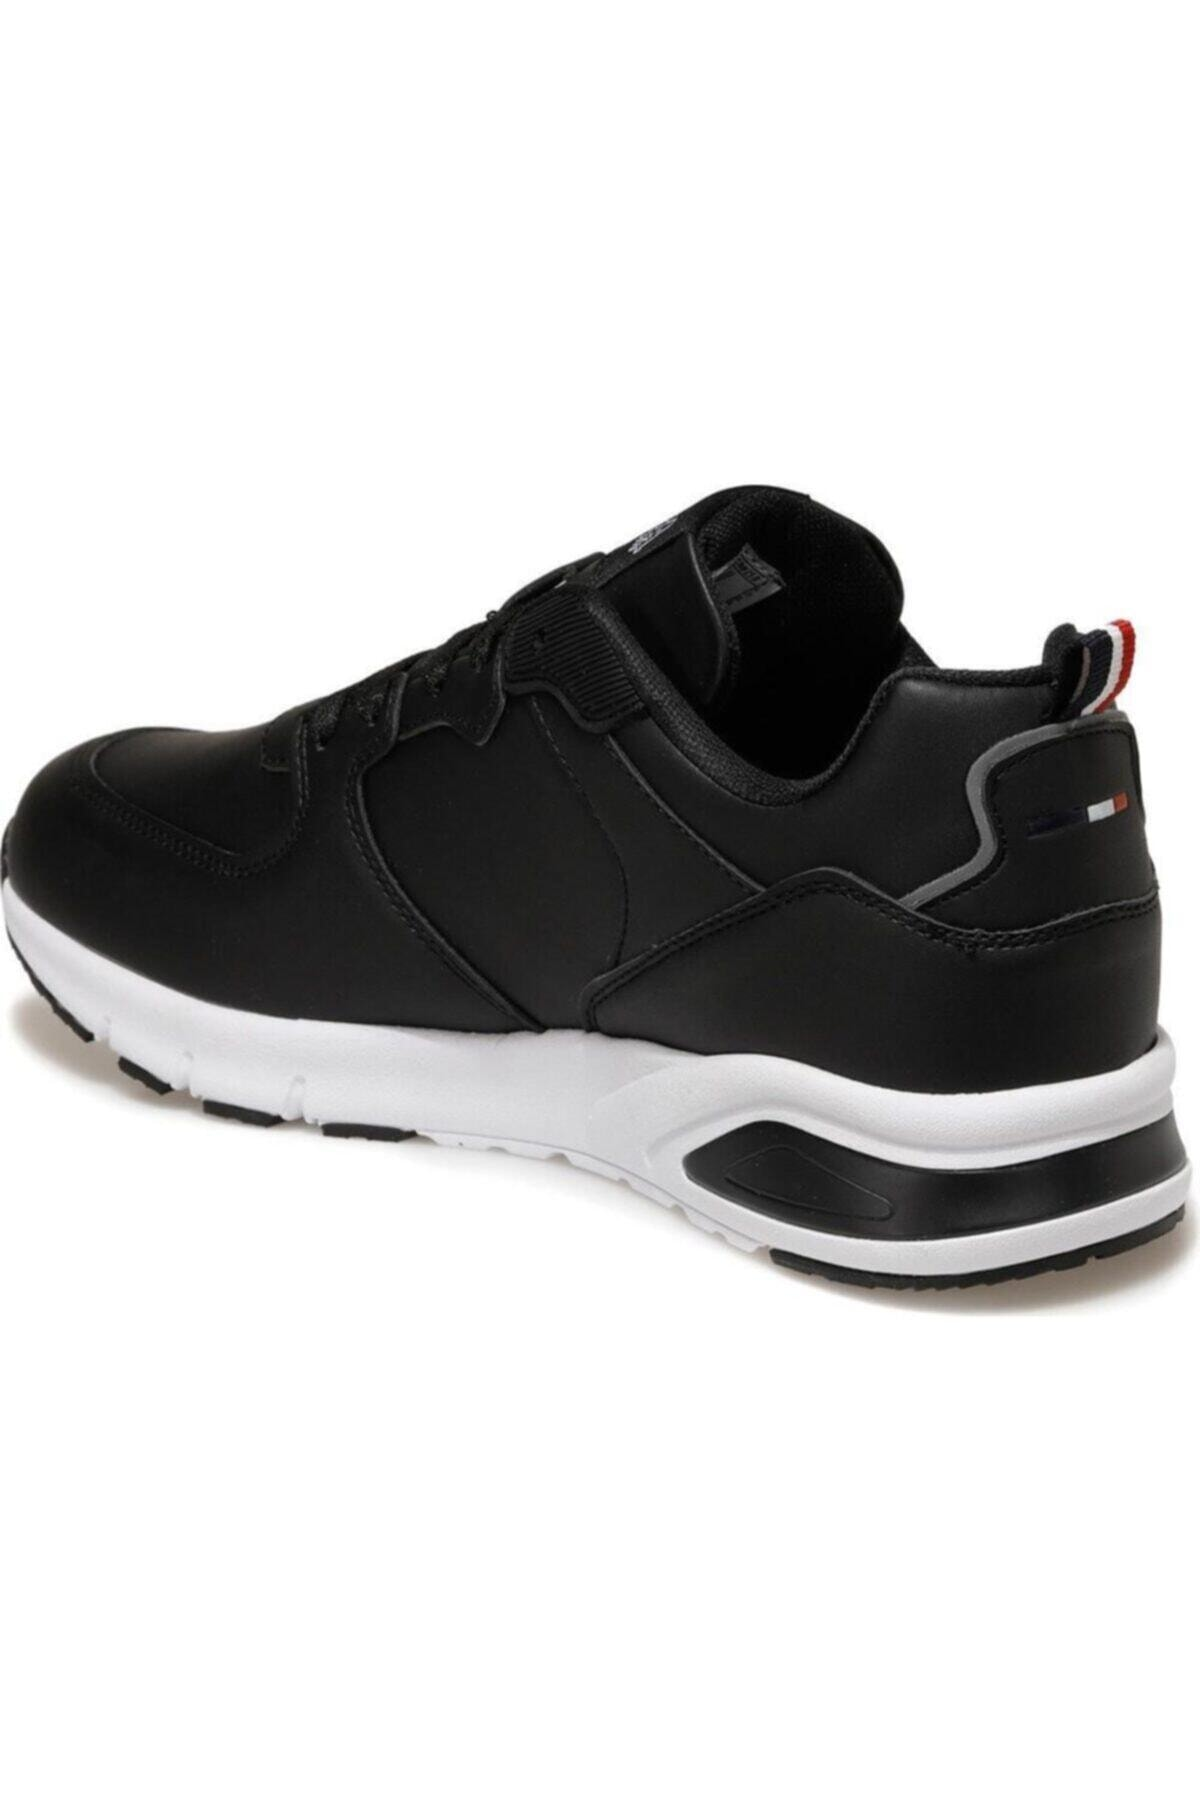 U.S POLO VANCE Siyah Erkek Sneaker Ayakkabı 100549423 1